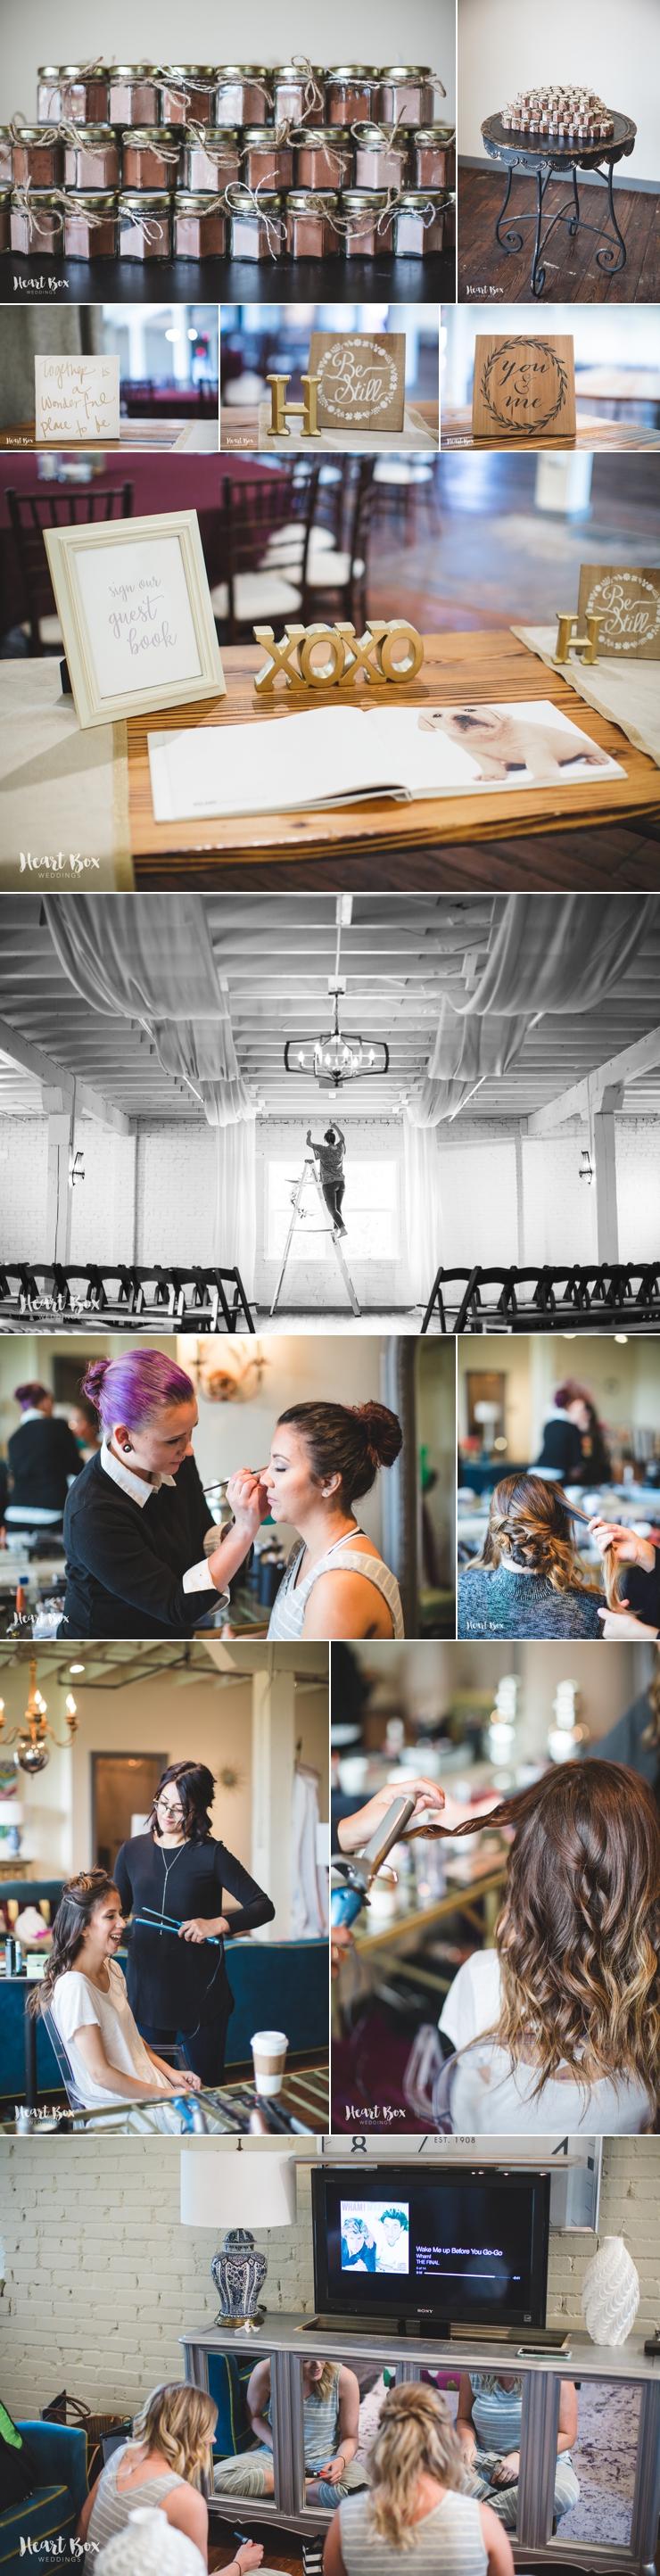 Hicks Wedding 5.jpg